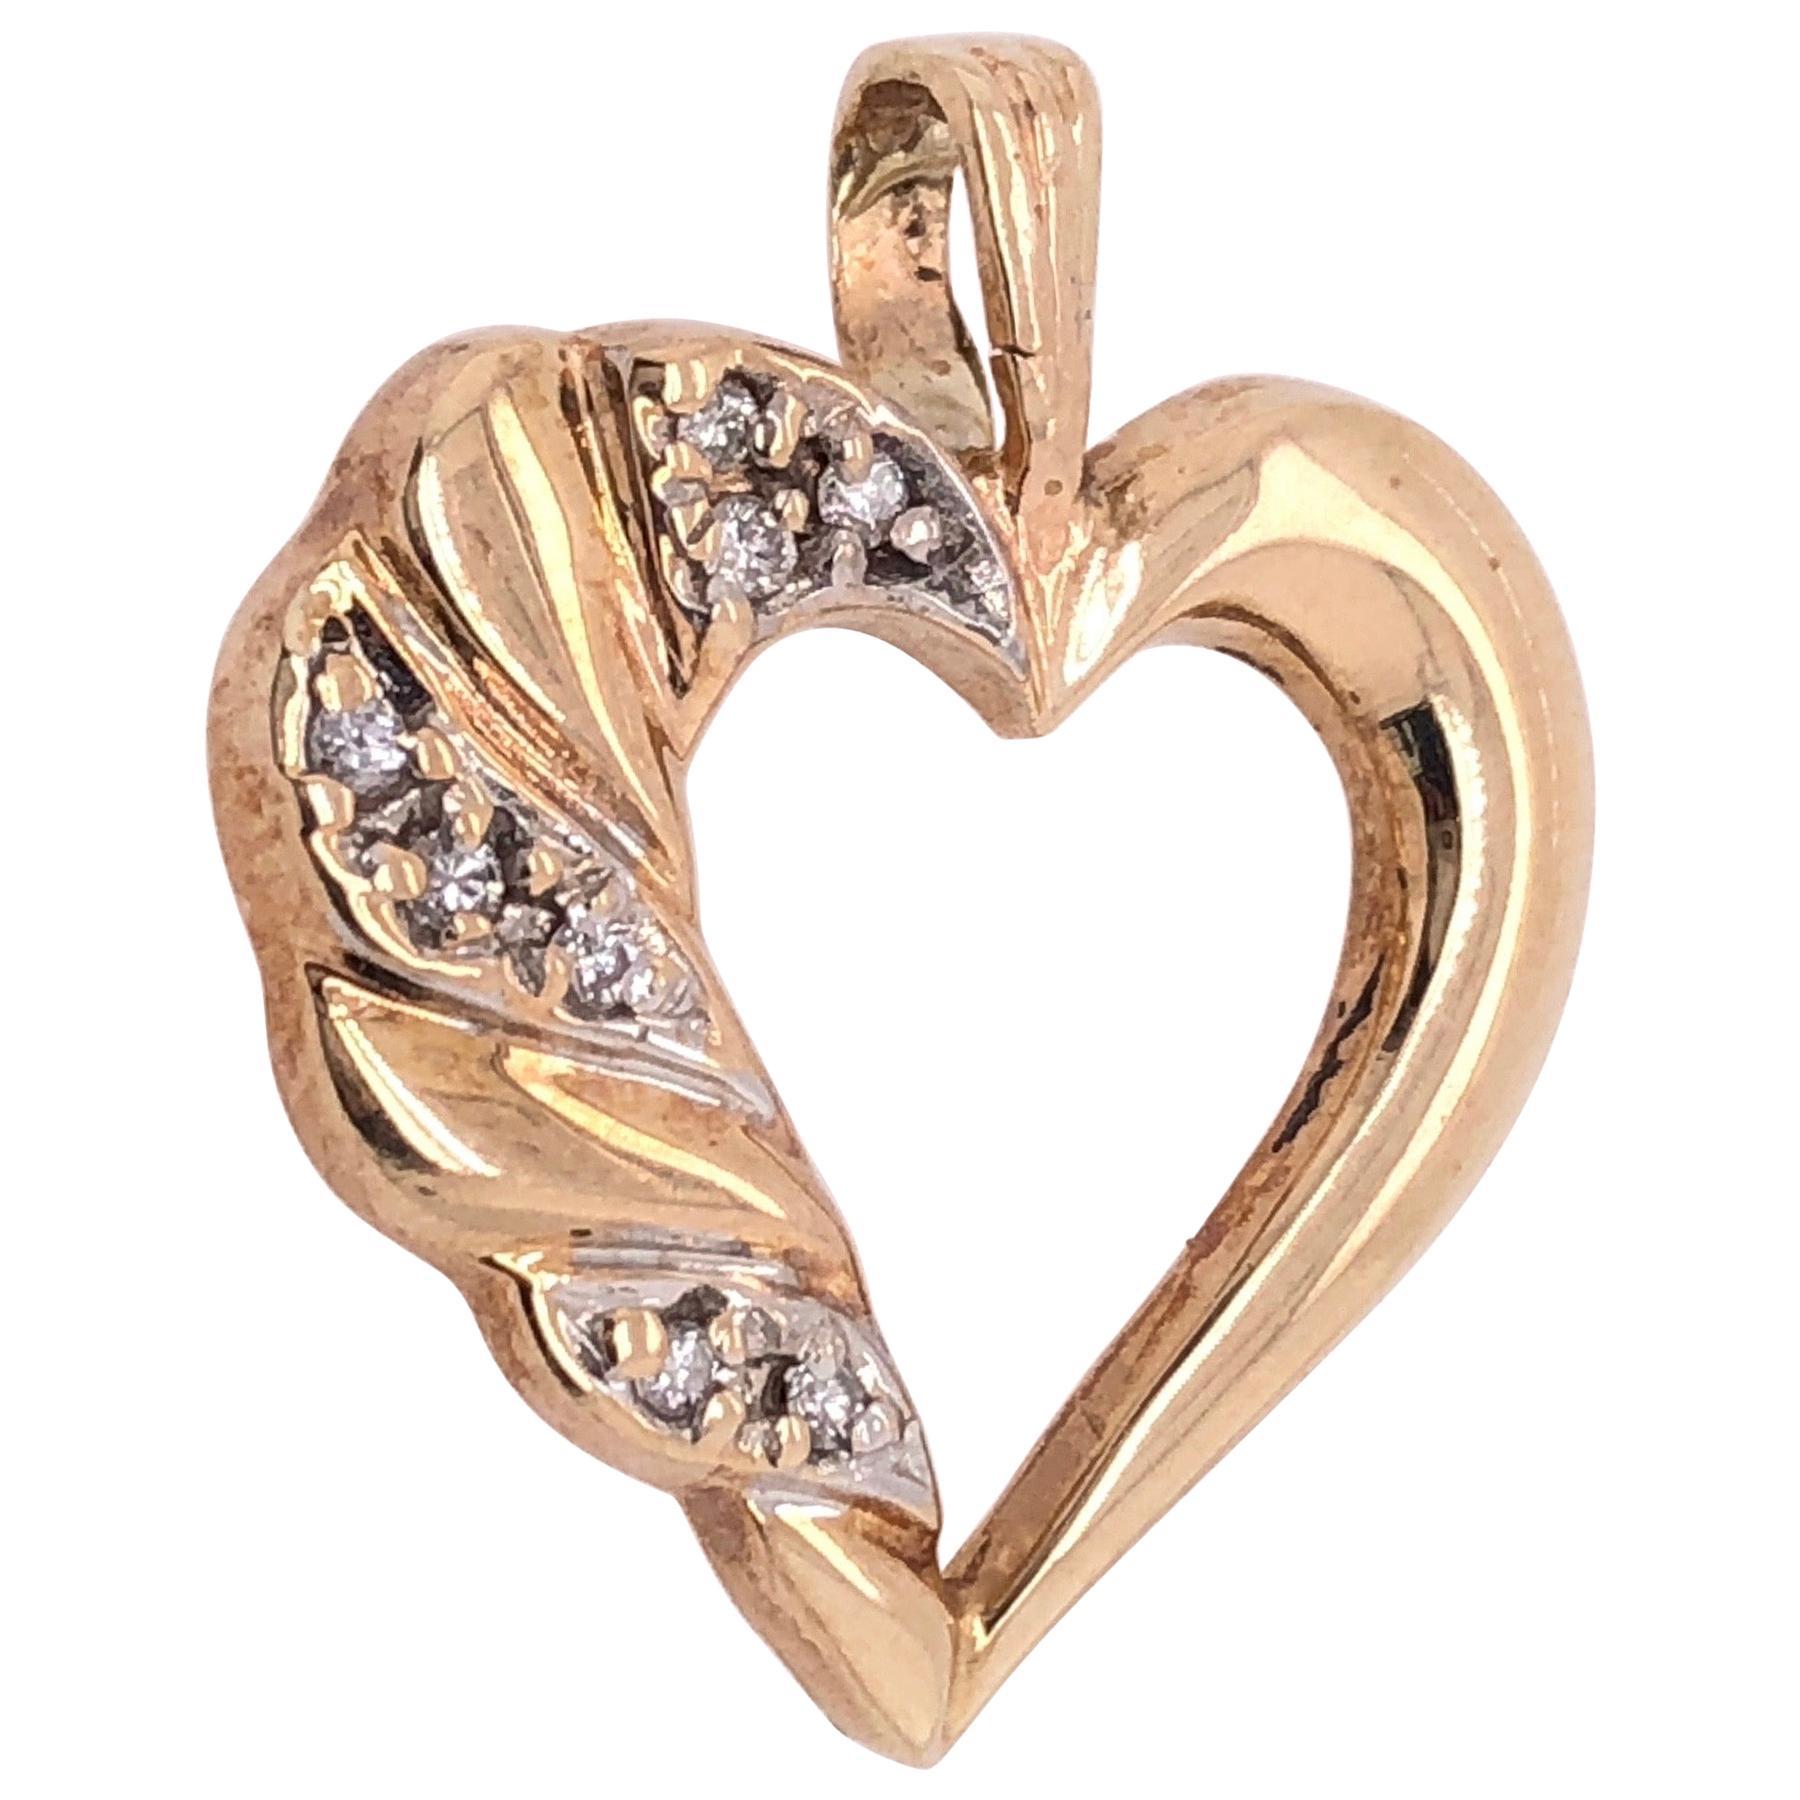 14 Karat Yellow Gold and Diamond Heart Pendant / Charm